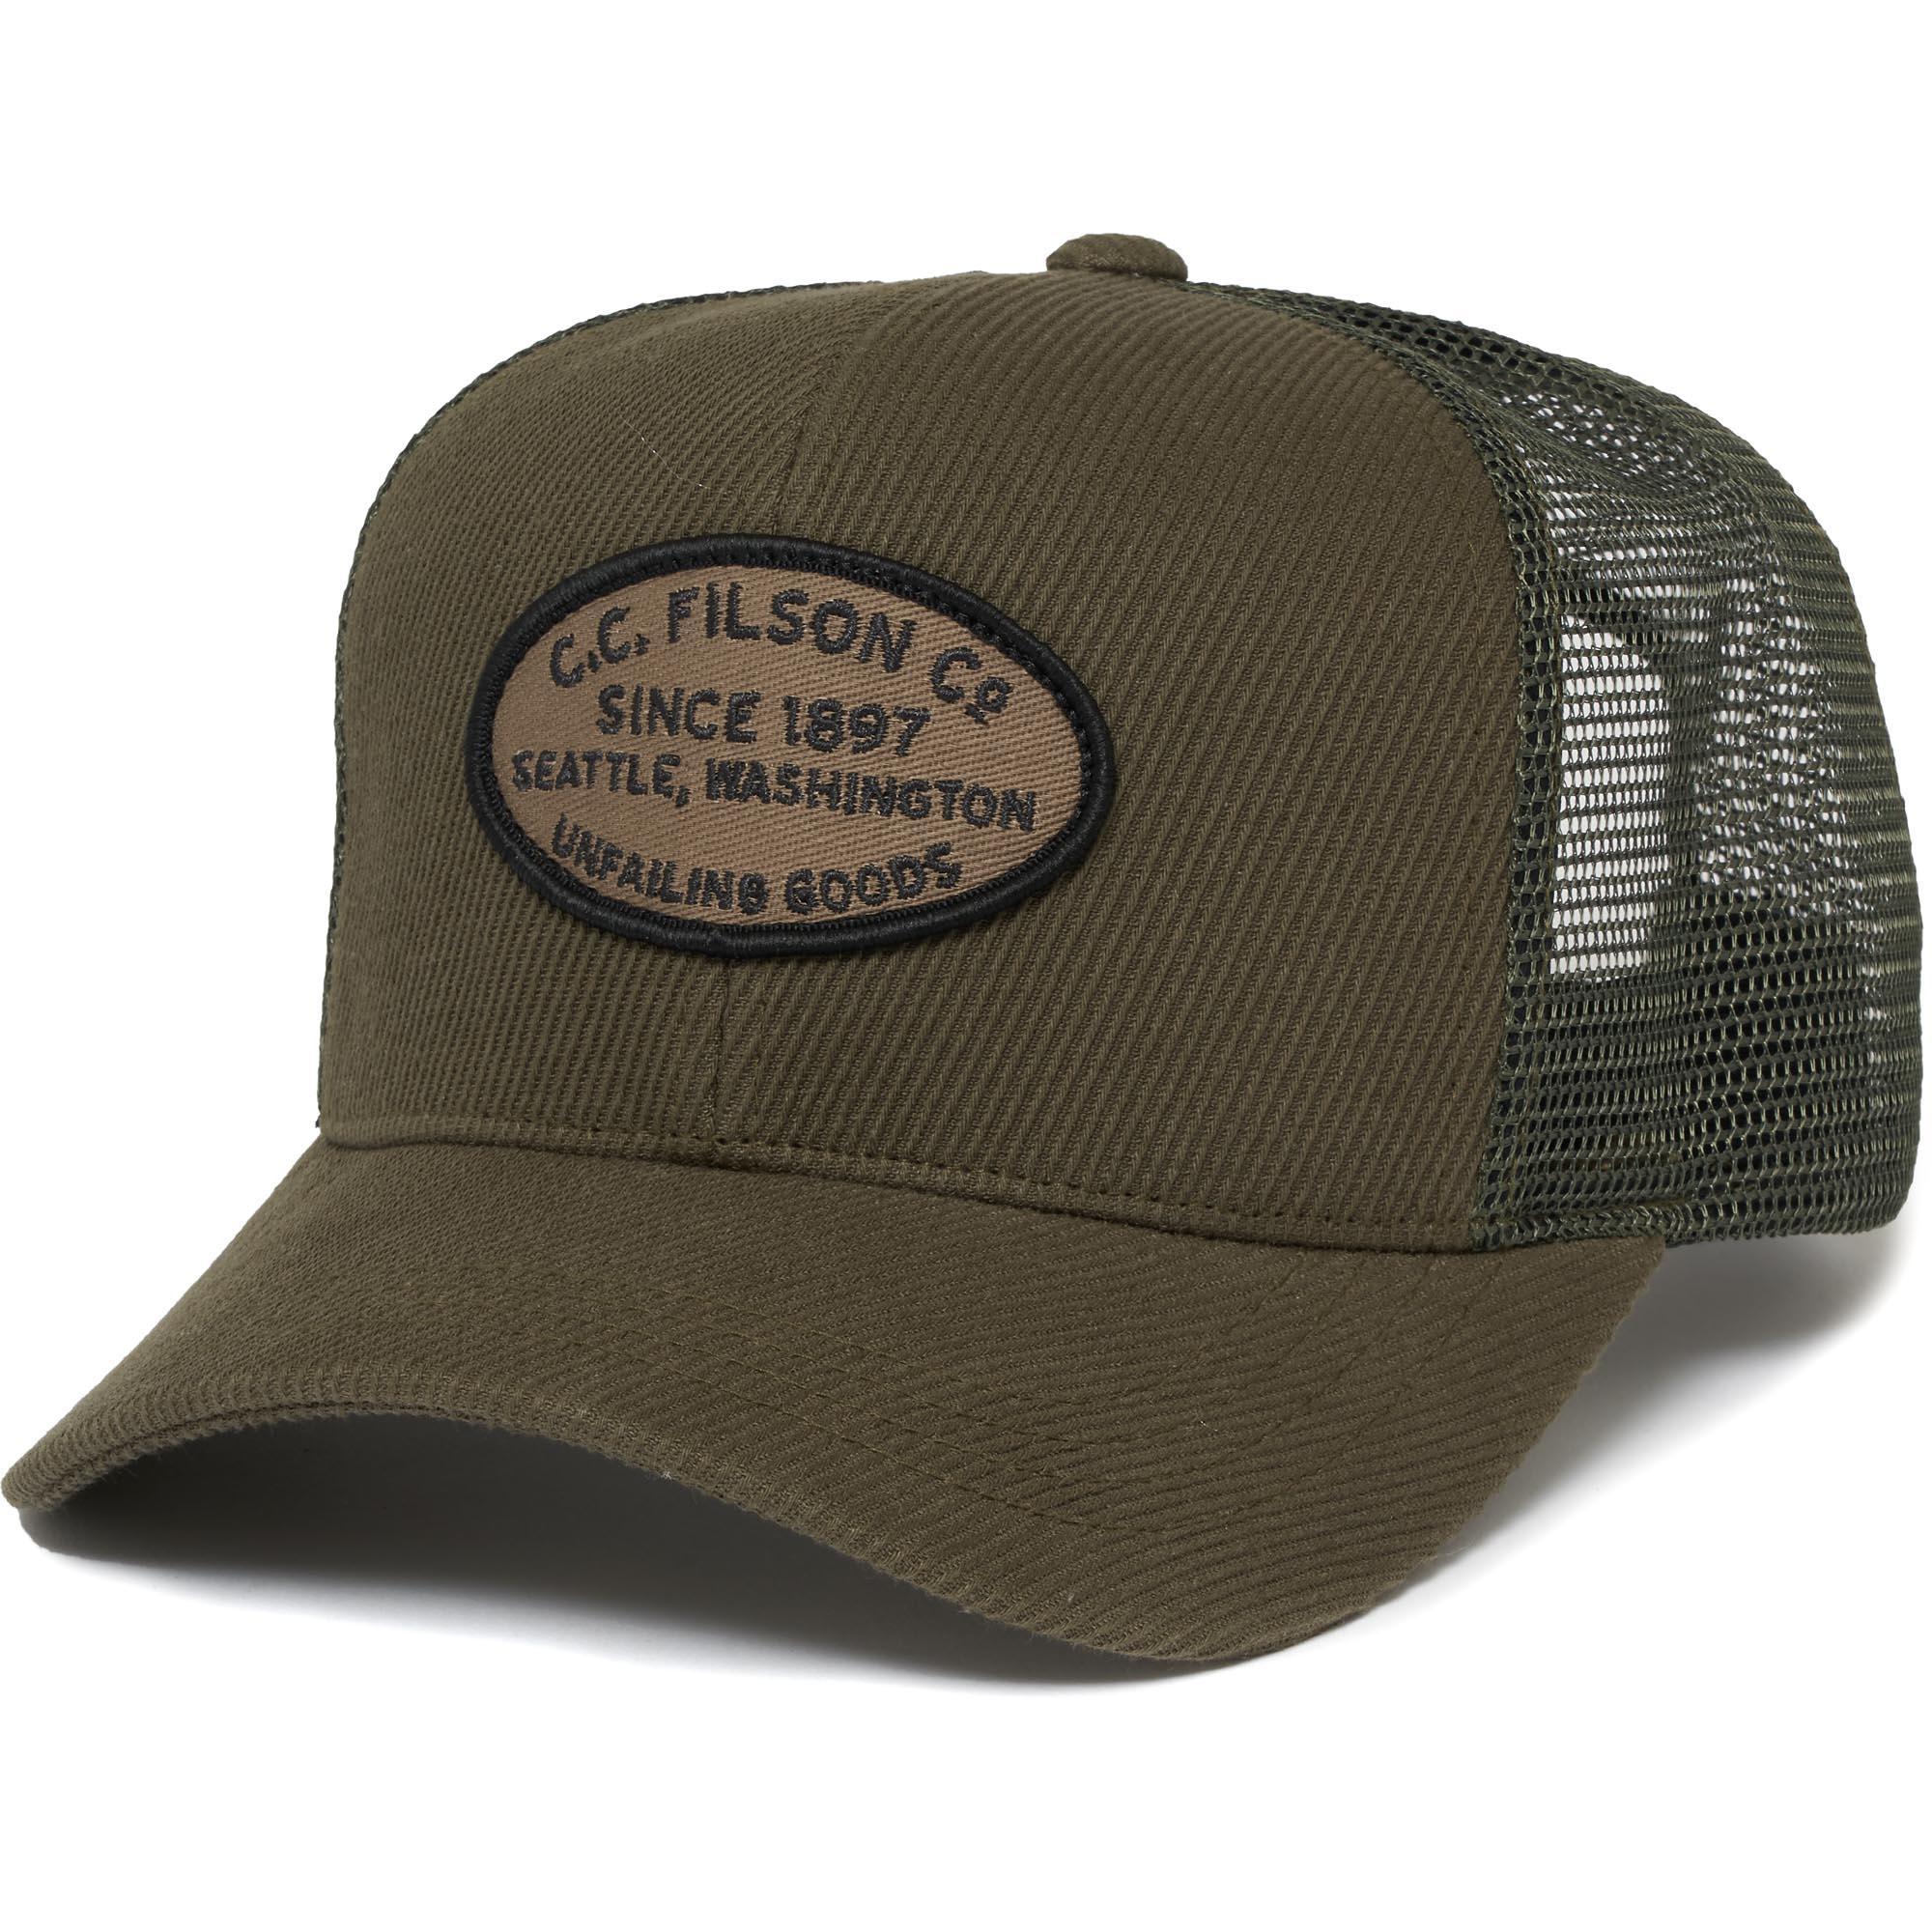 585841f1f51 Filson Buckshot Twill Mesh Cap in Green for Men - Lyst